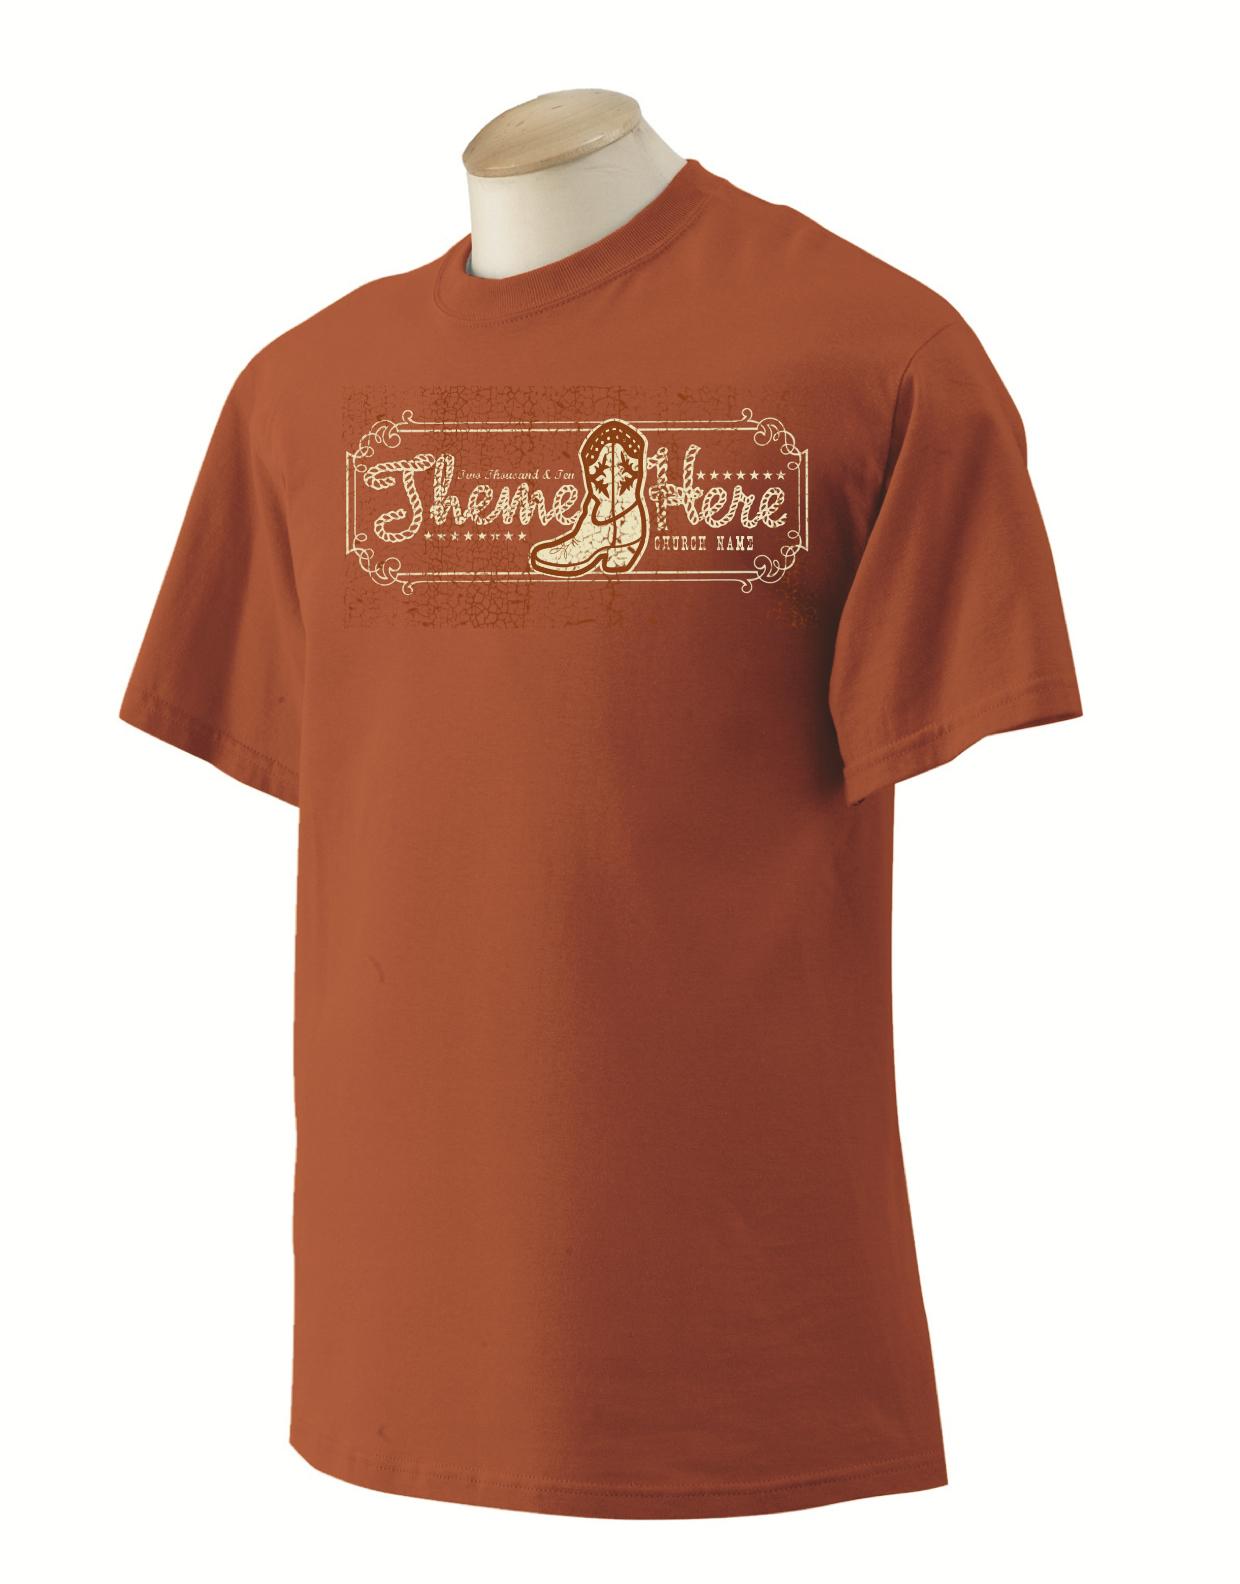 Ranch 2 texas orange shirt.jpg